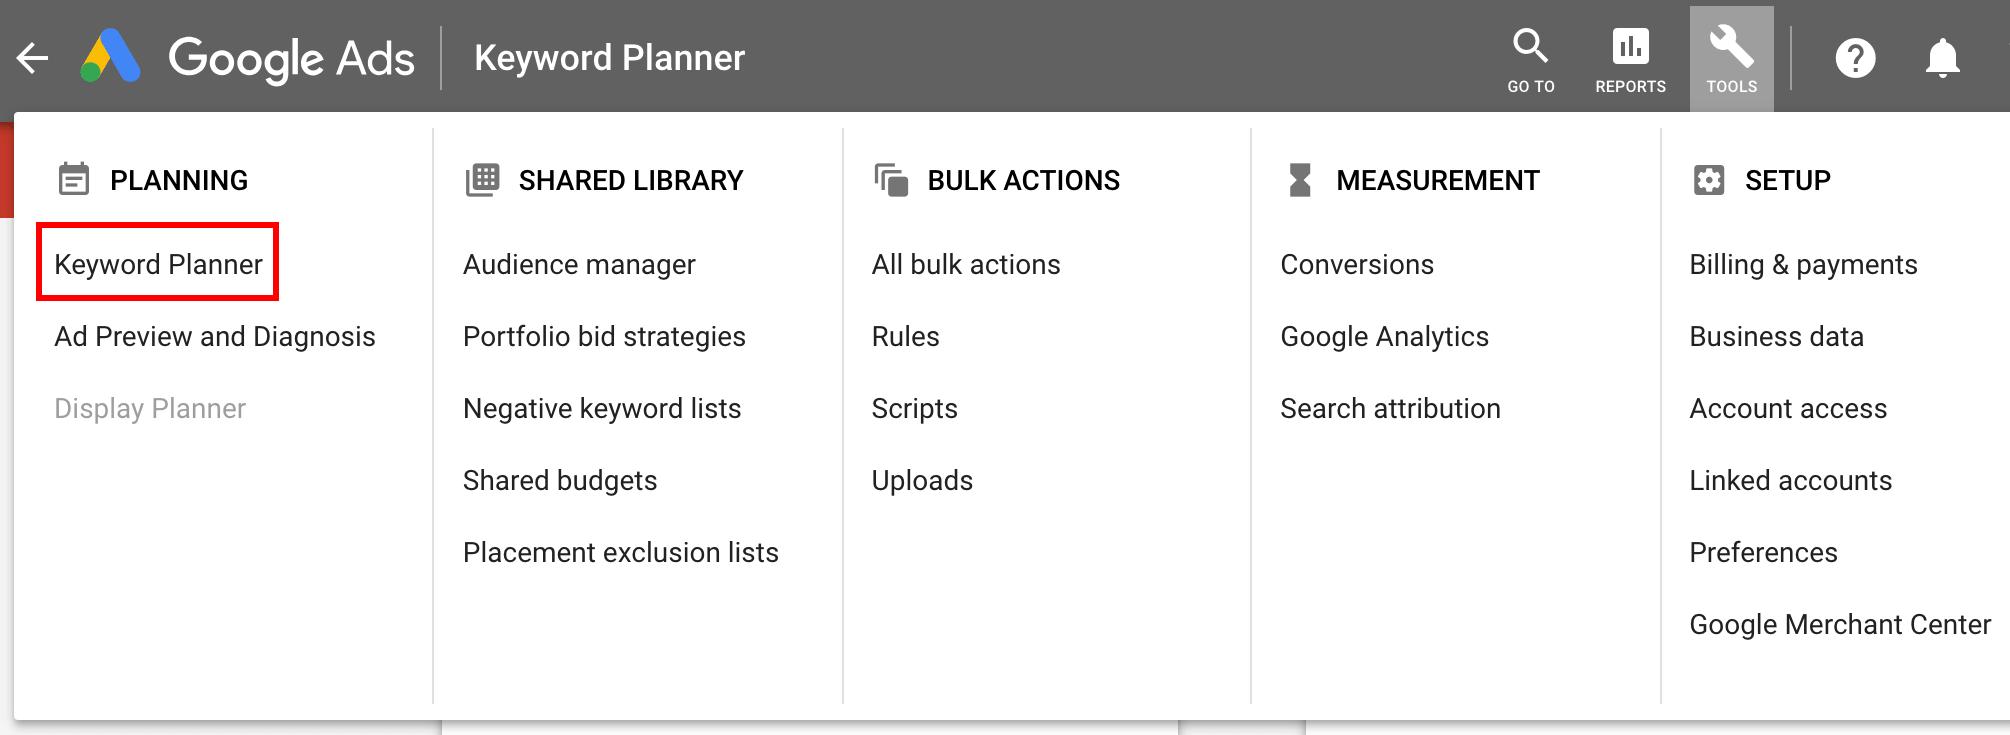 finding keyword planner